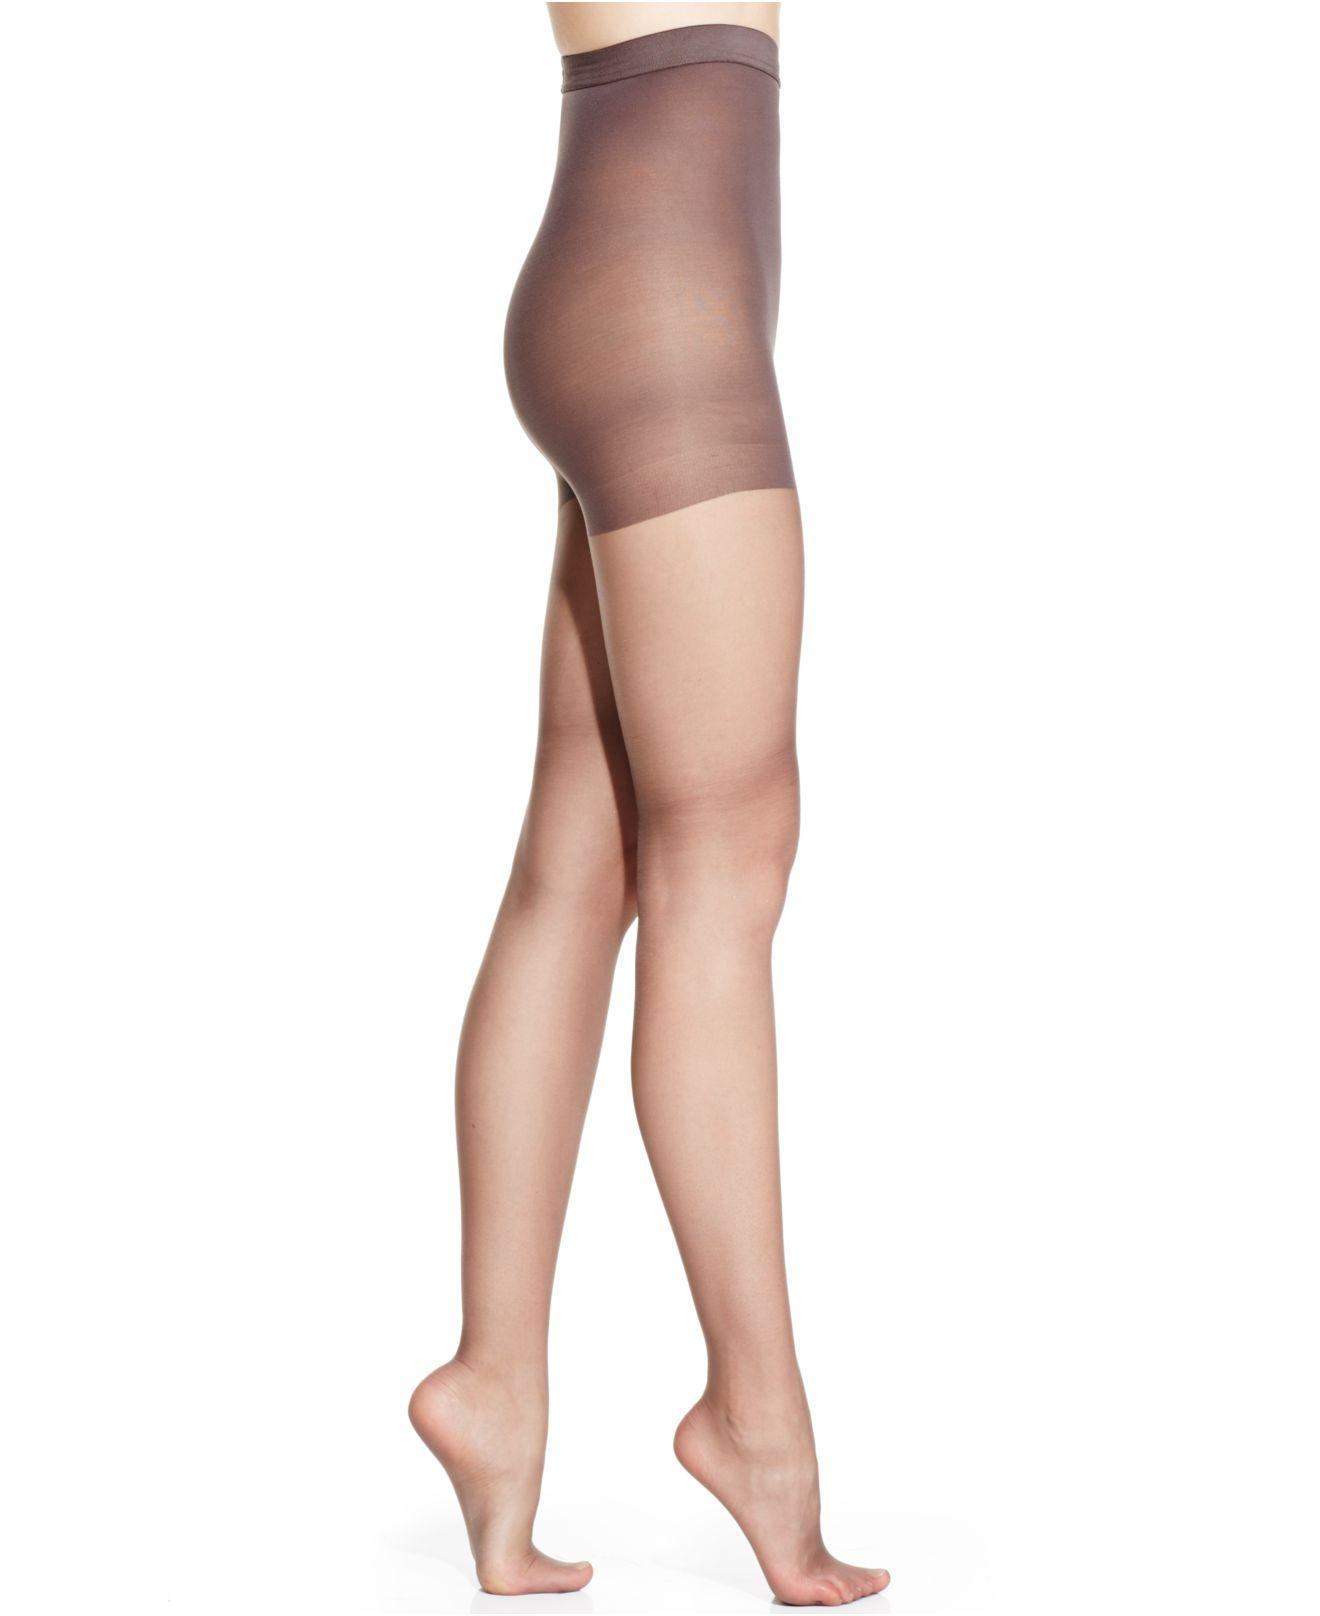 7938b980952e5 Hanes. Women's Silk Reflections High Waist Tummy Control Top Silky Sheers  0b184